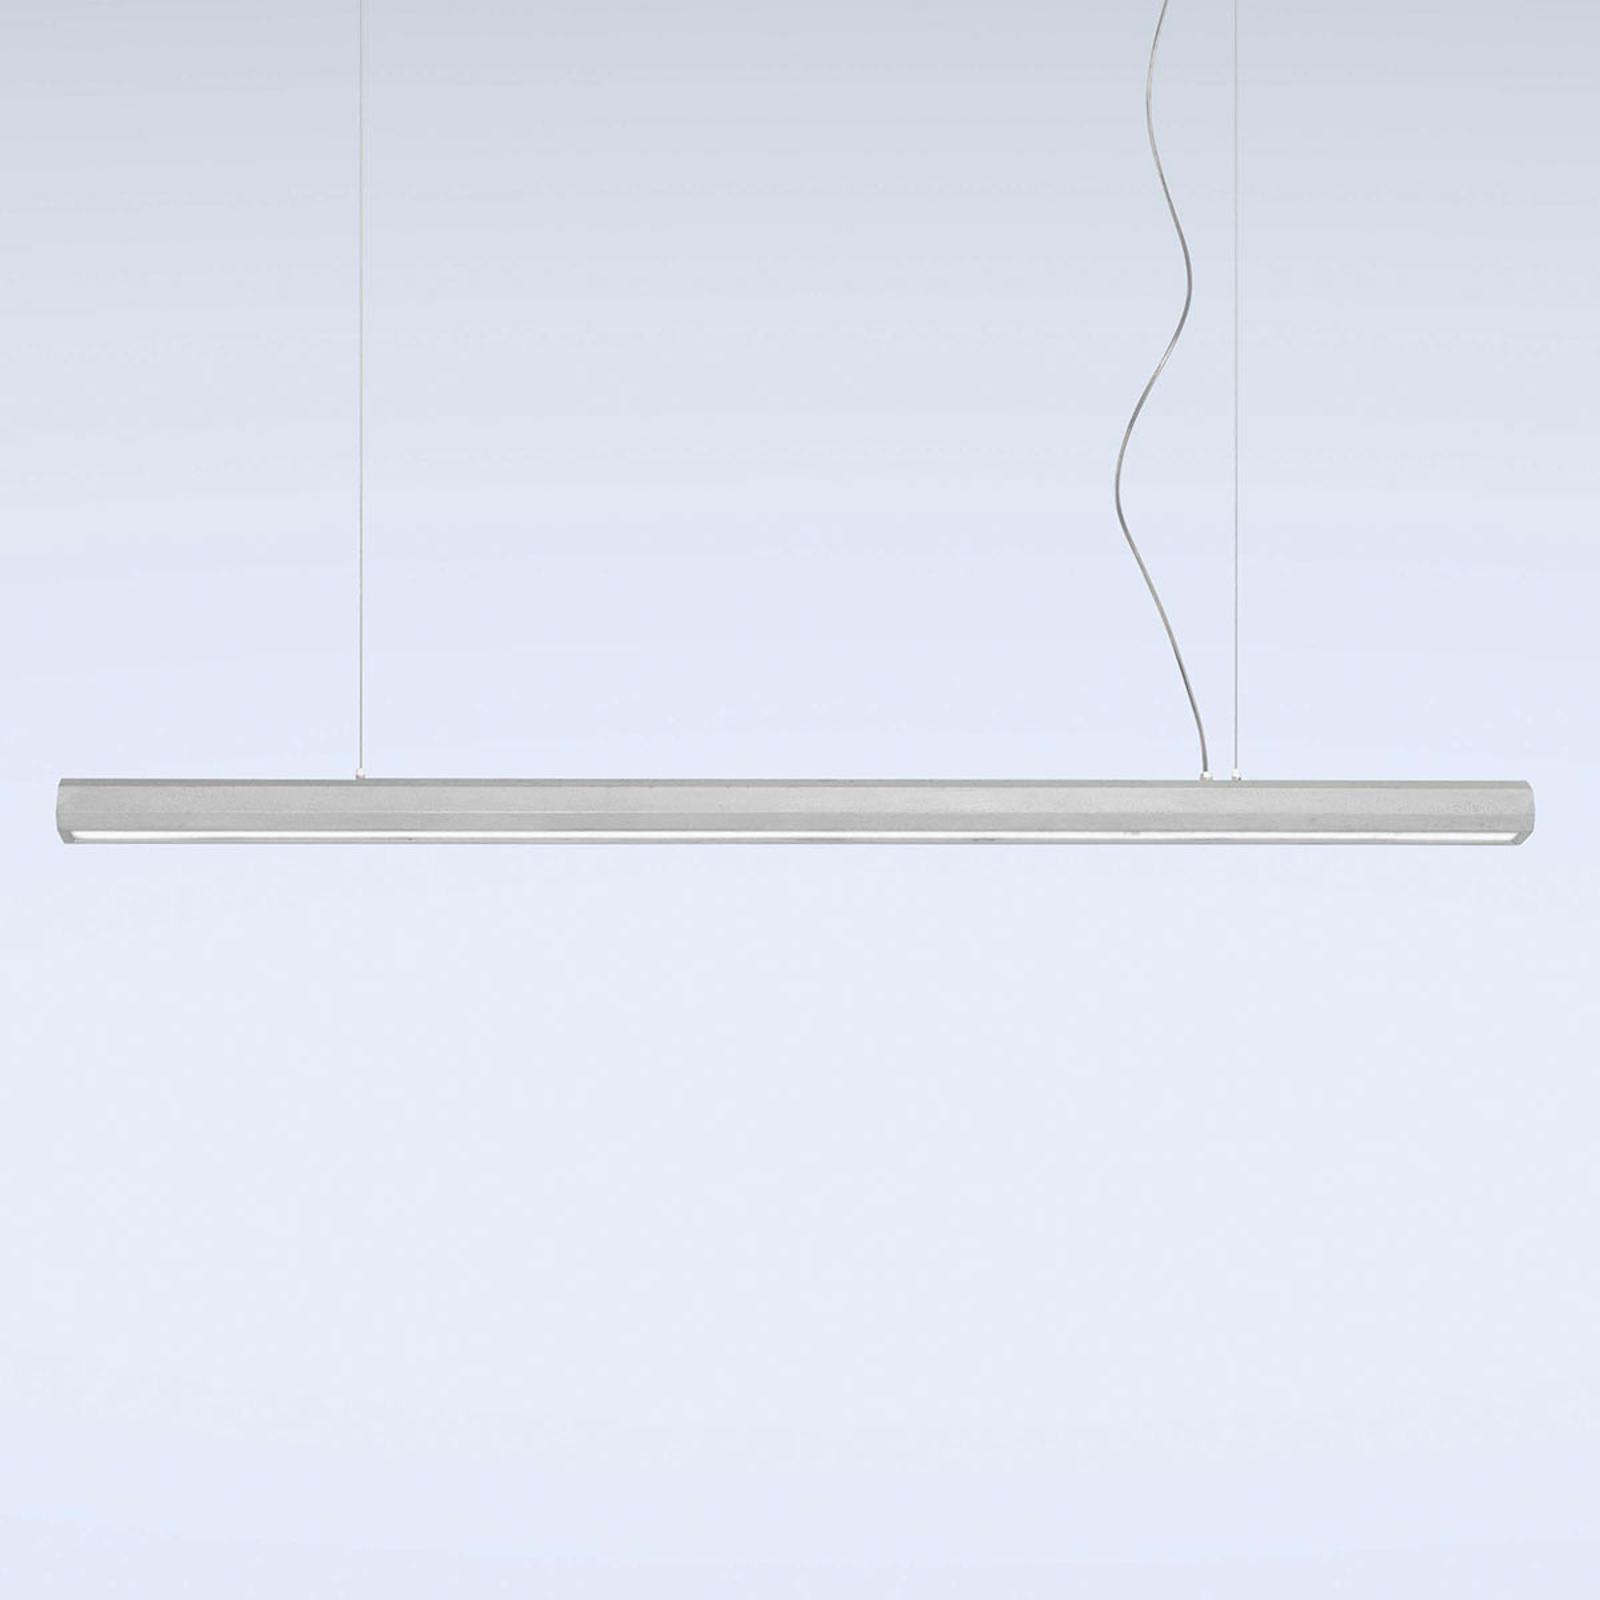 LED-riippuvalaisin Materica, tanko 150 cm, betoni